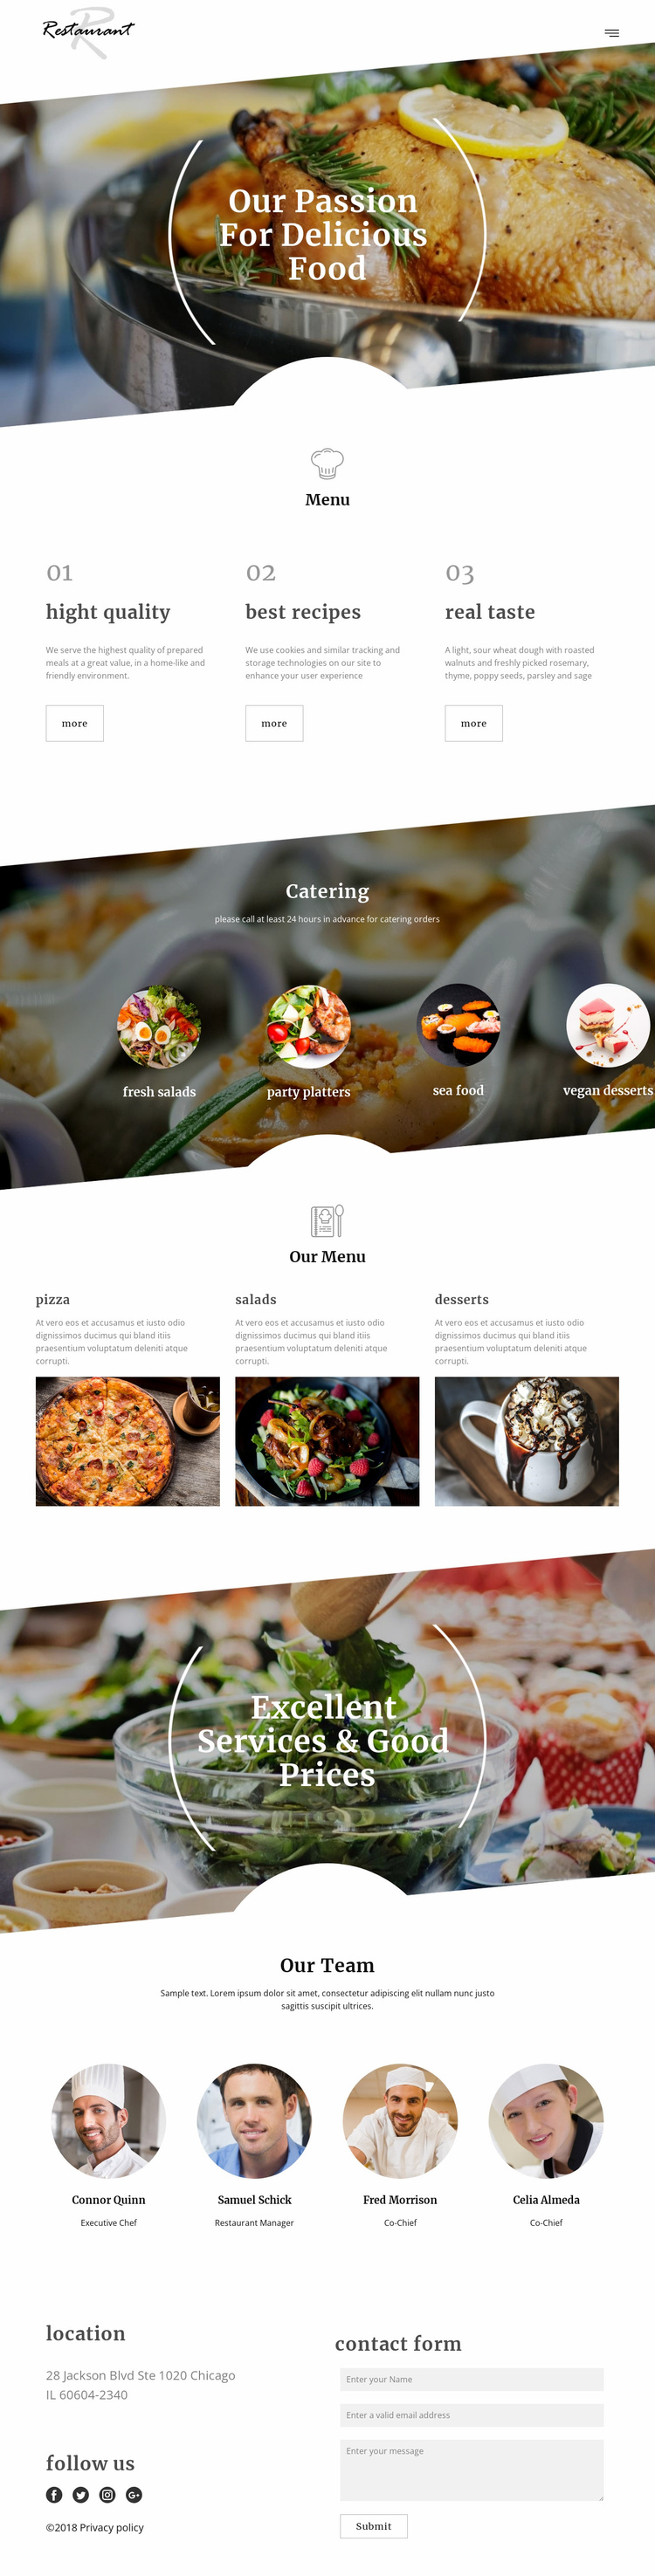 Executive chef recipes Landing Page